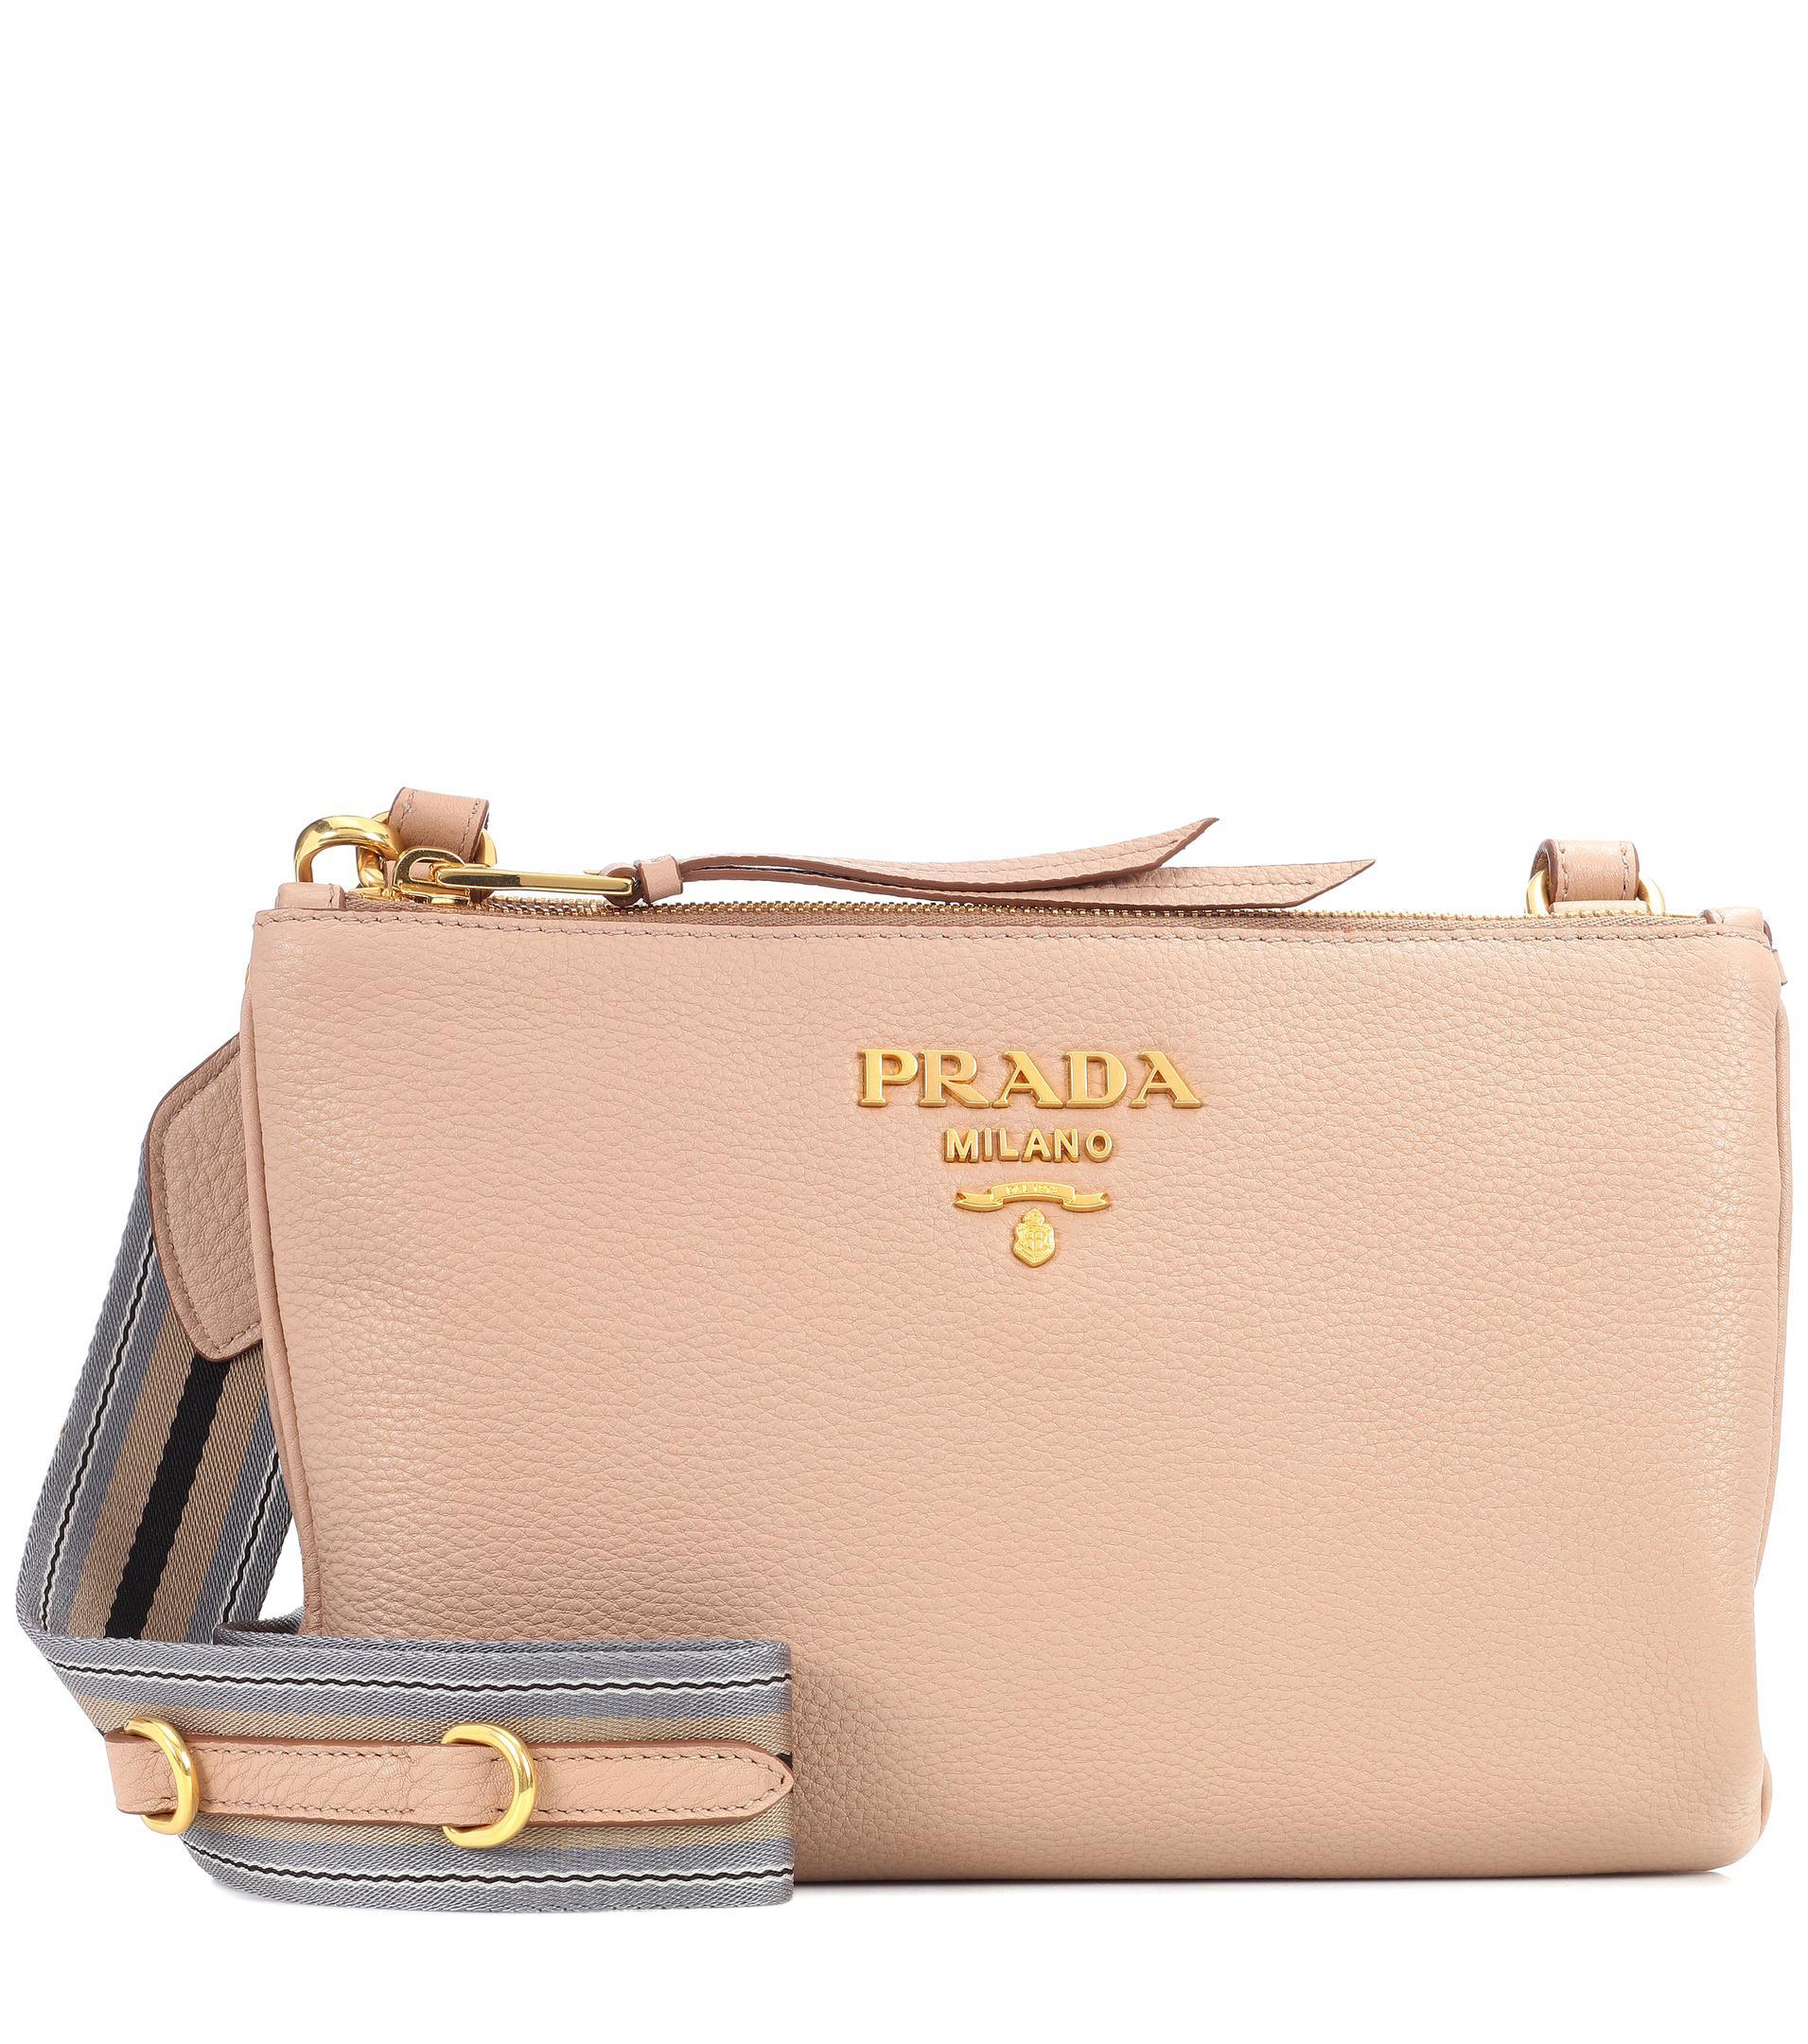 10726ba957d1 Prada Daino Small Leather Crossbody Bag in Natural - Lyst